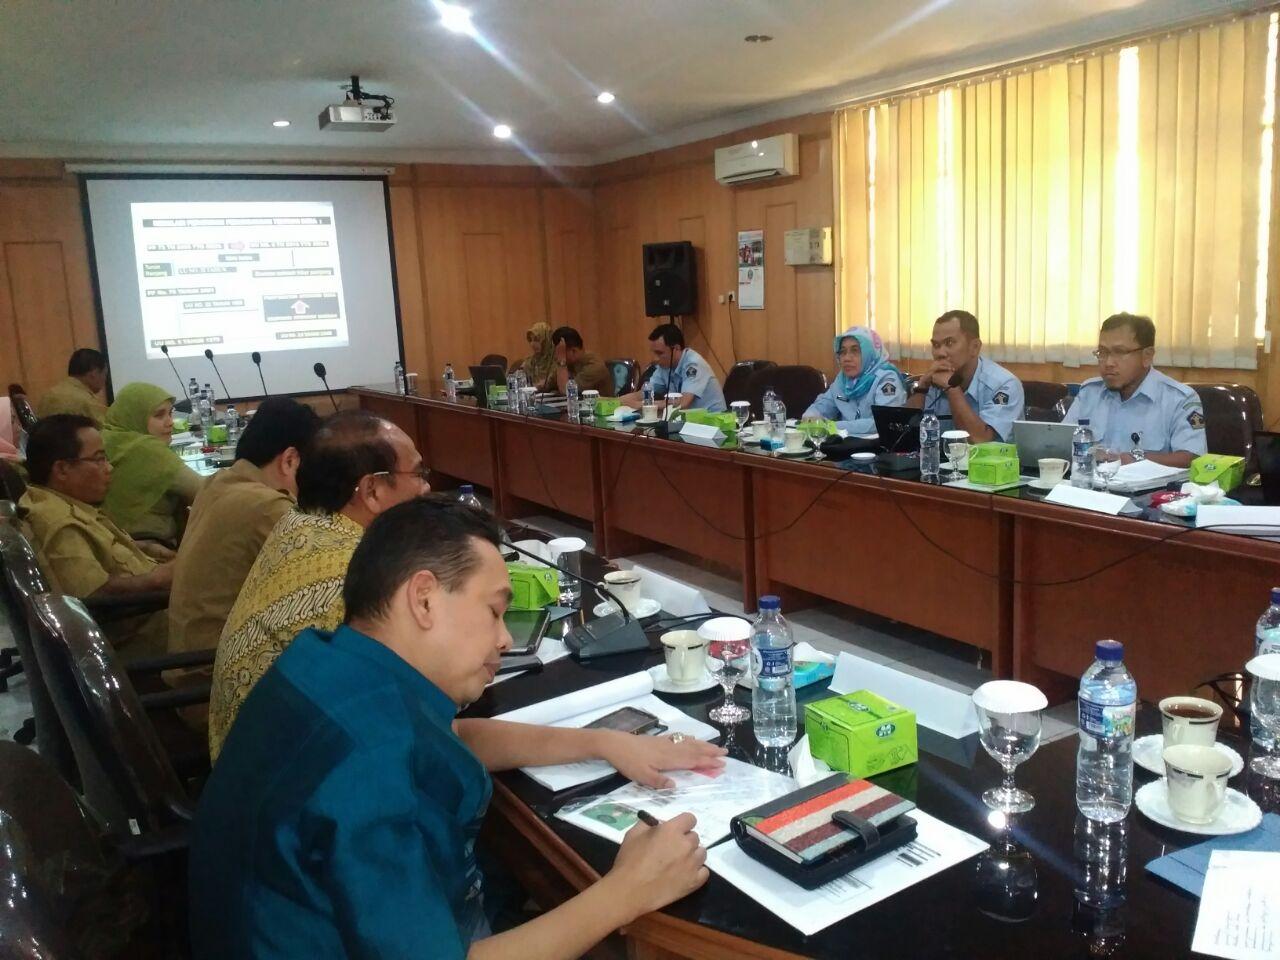 Presentasi Draft Laporan Penelitian Tentang Sistem Pemerintahan Desa dalam Perspektif Undang-Undang Nomor 6 Tahun 2014 di Sumatera Utara